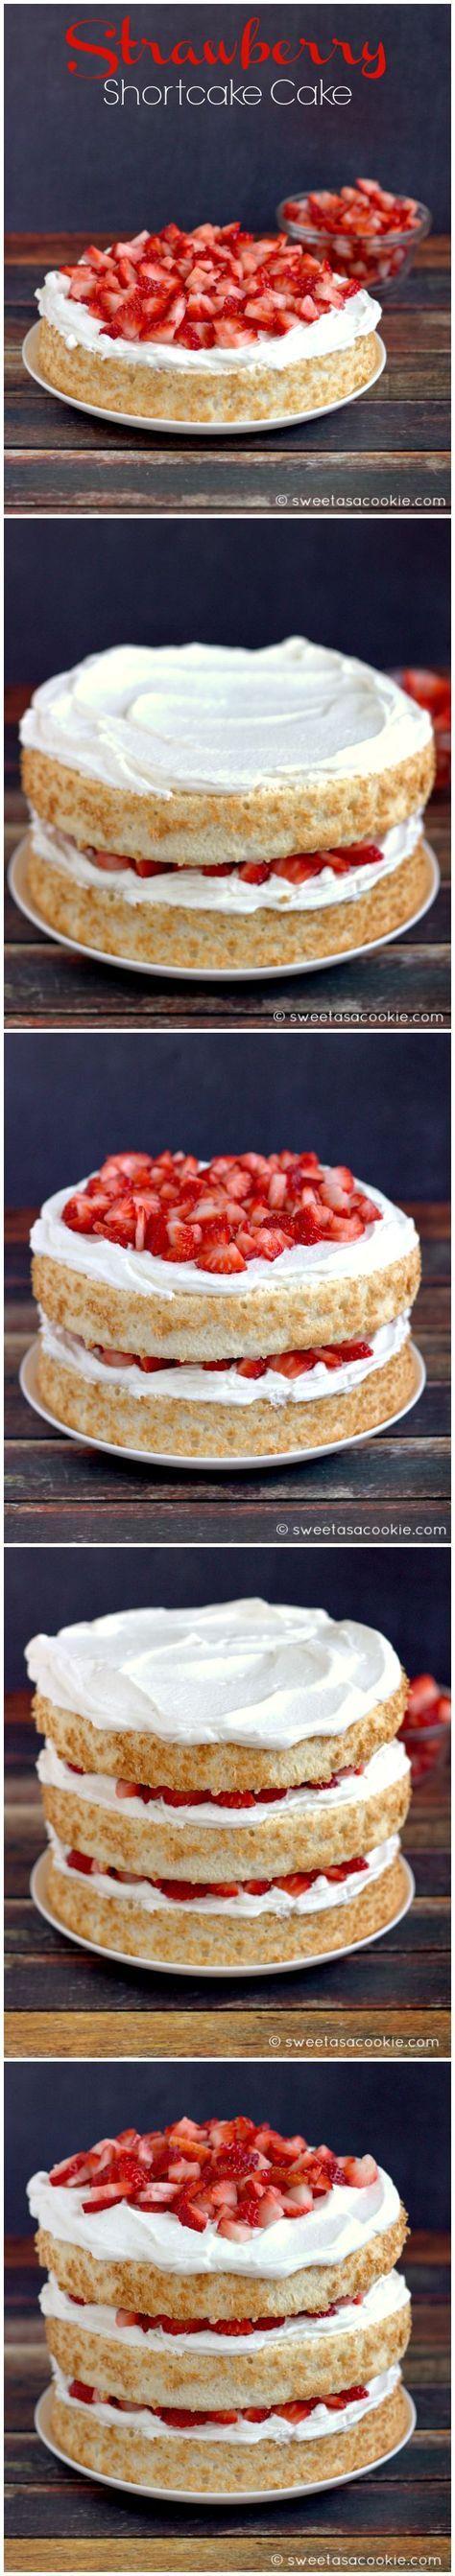 Strawberry Shortcake Cake Recipe Cake Food And Deserts